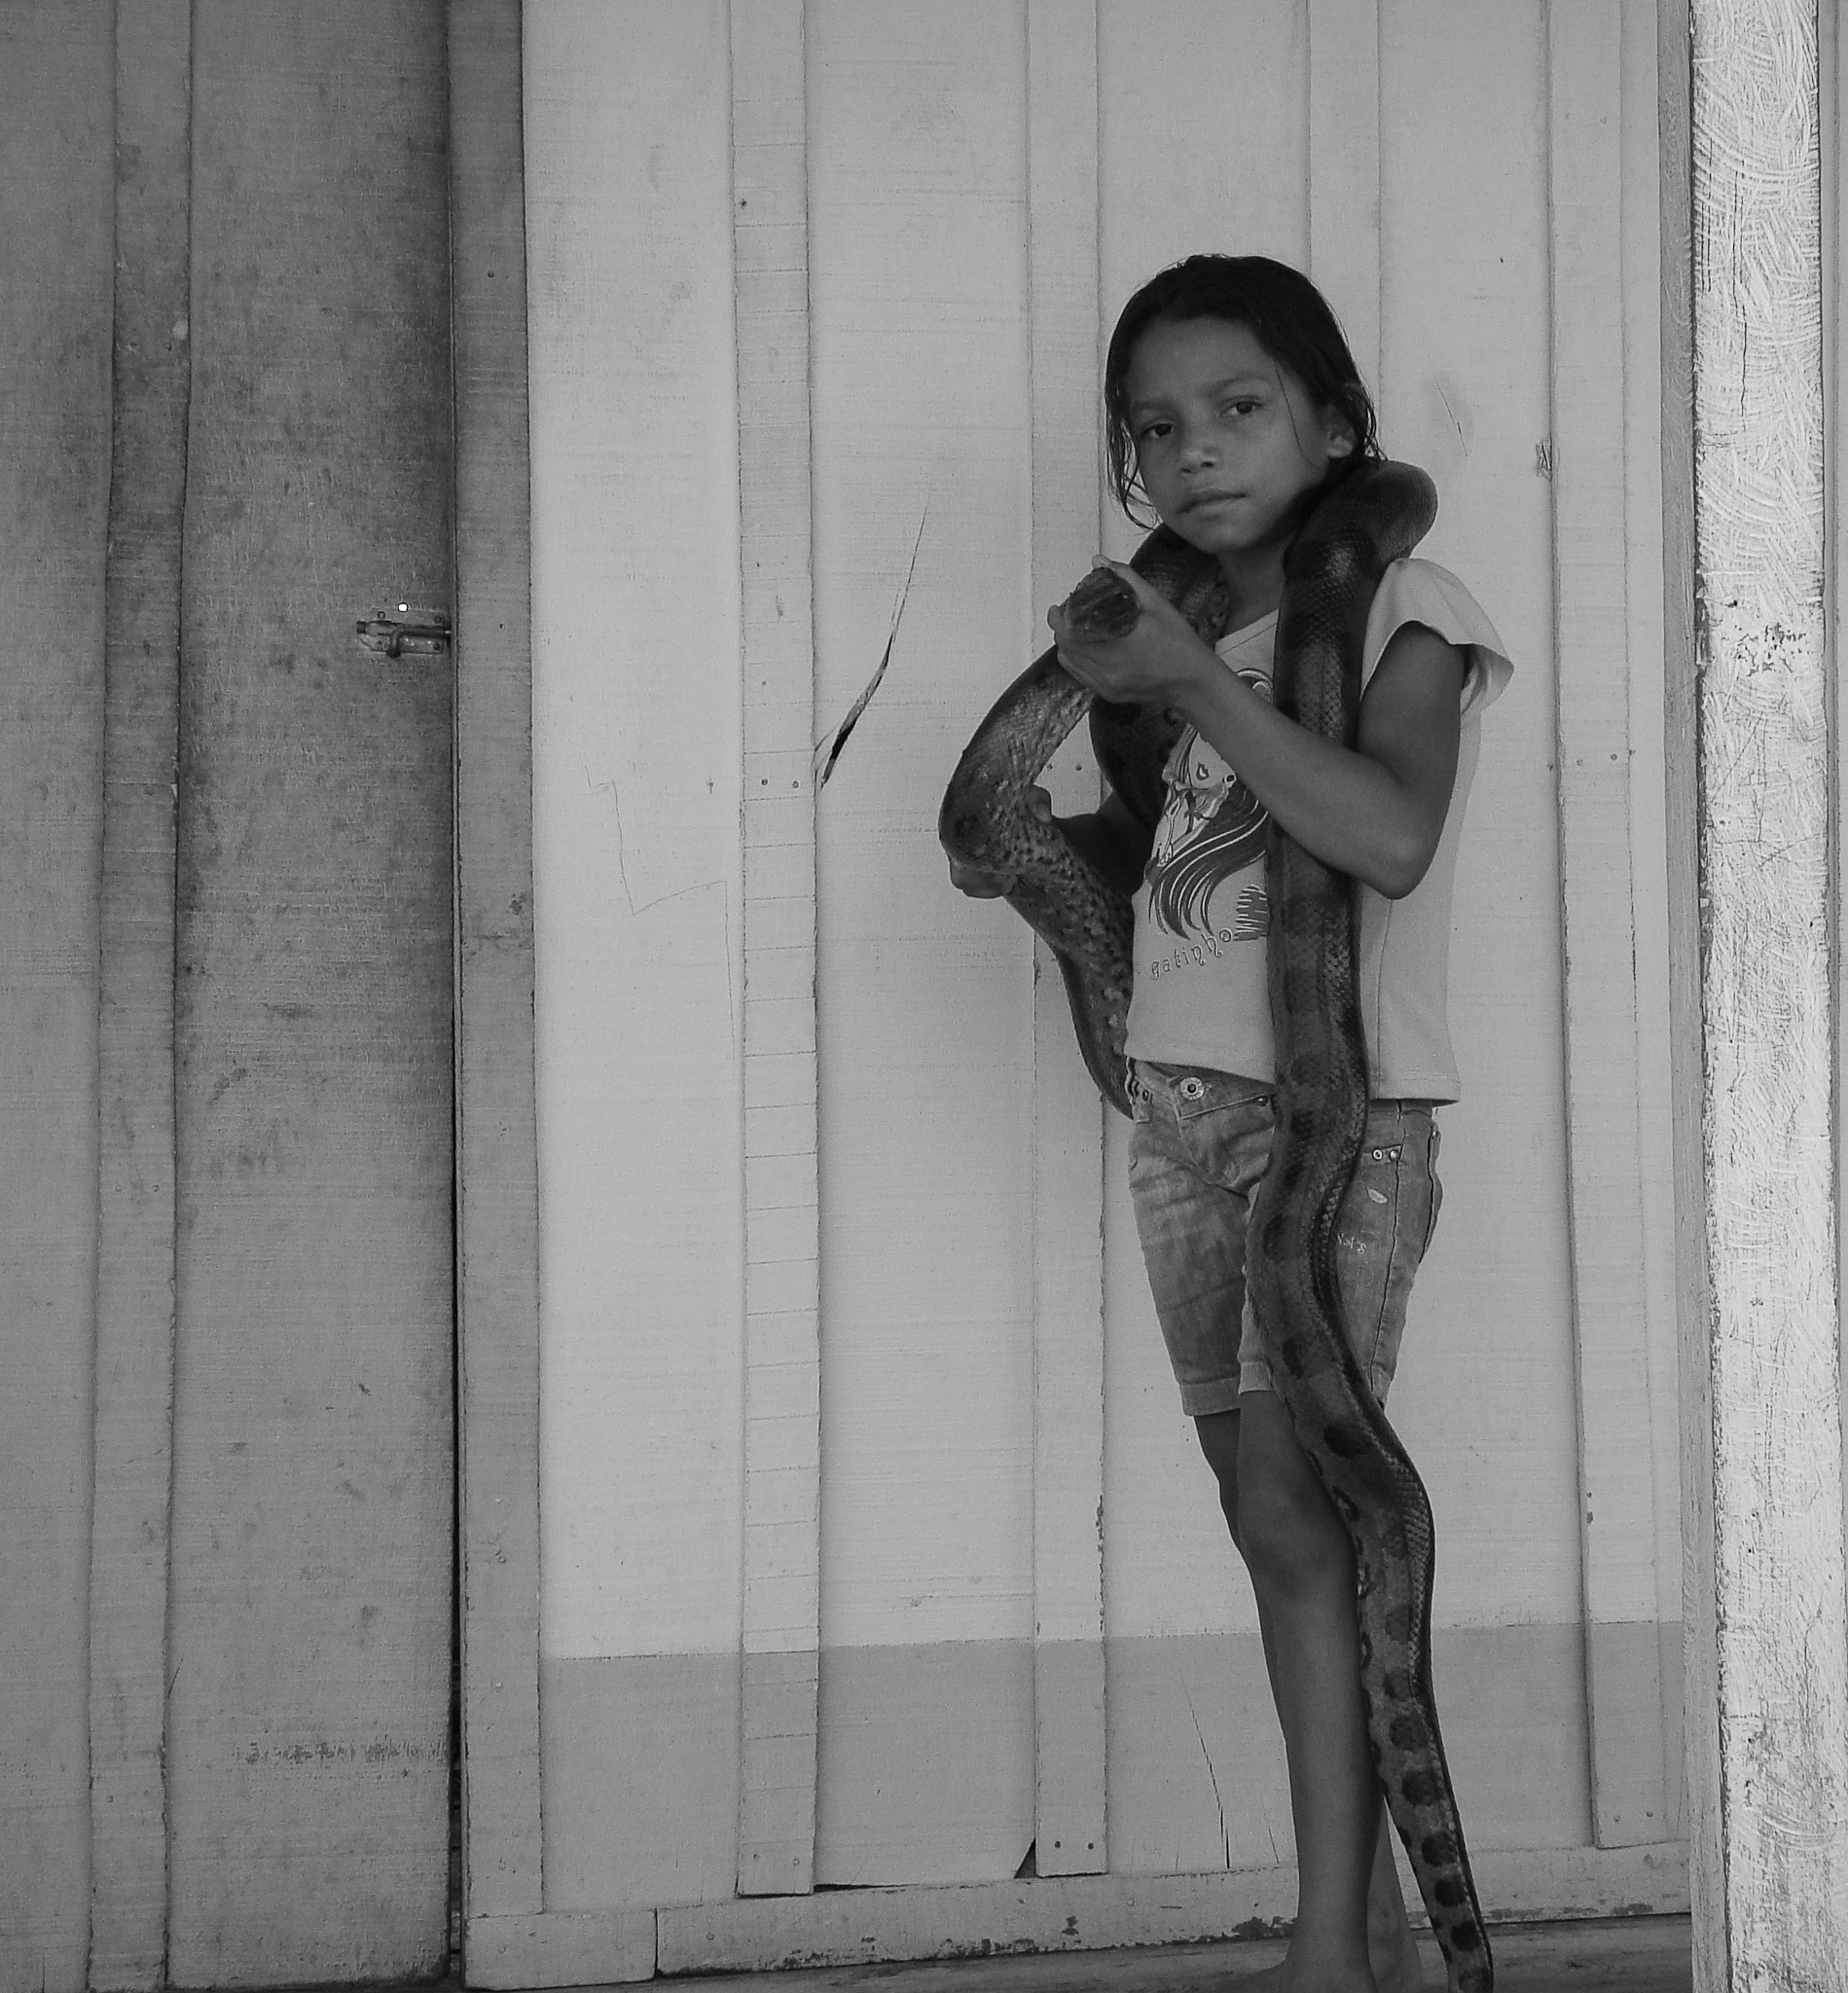 Amazonas 2 by Alexandre Rossi Gurgel